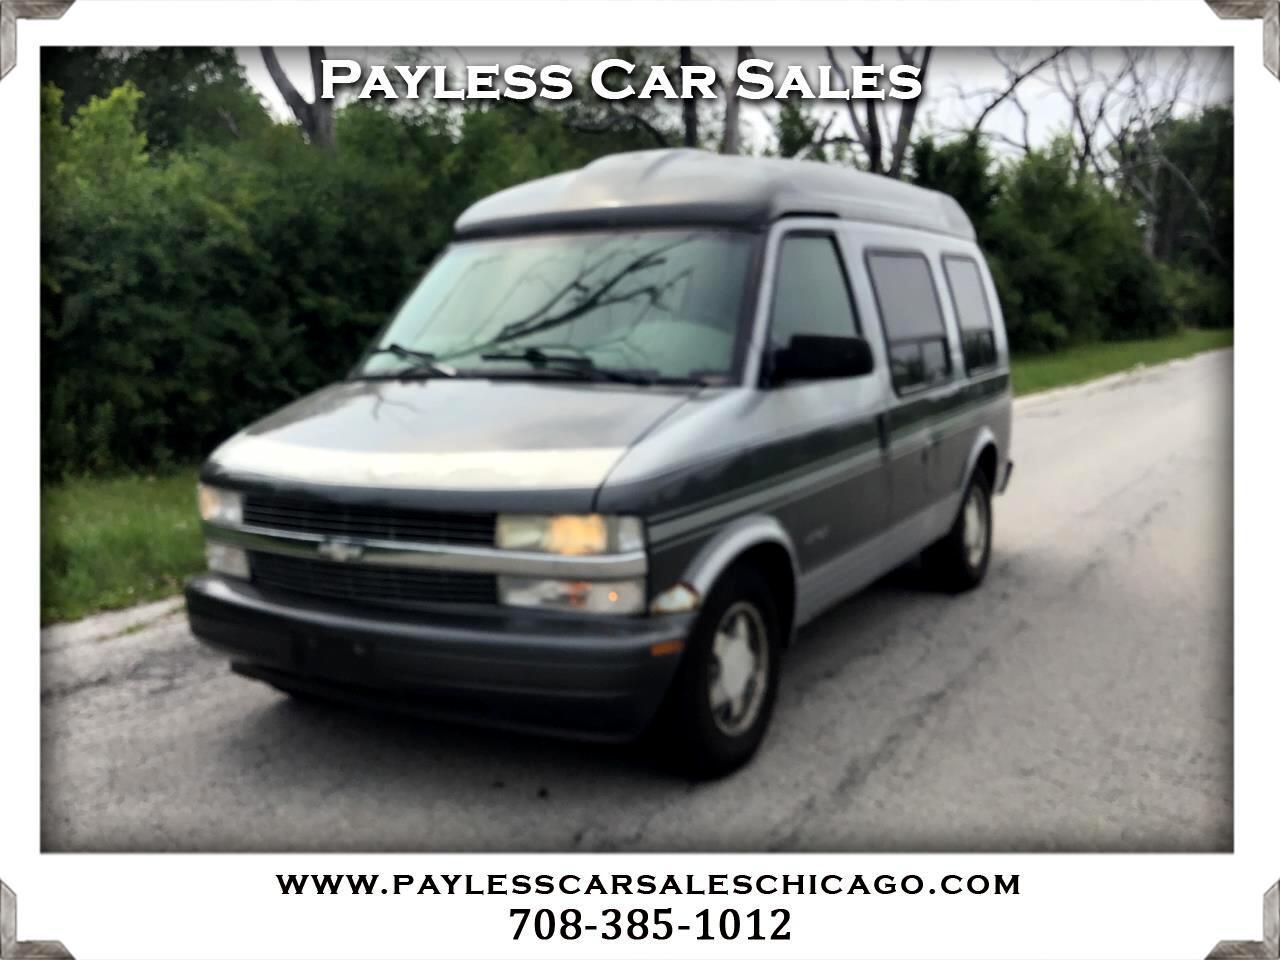 "Chevrolet Astro Cargo Van 111.2"" WB RWD w/YF7 2000"